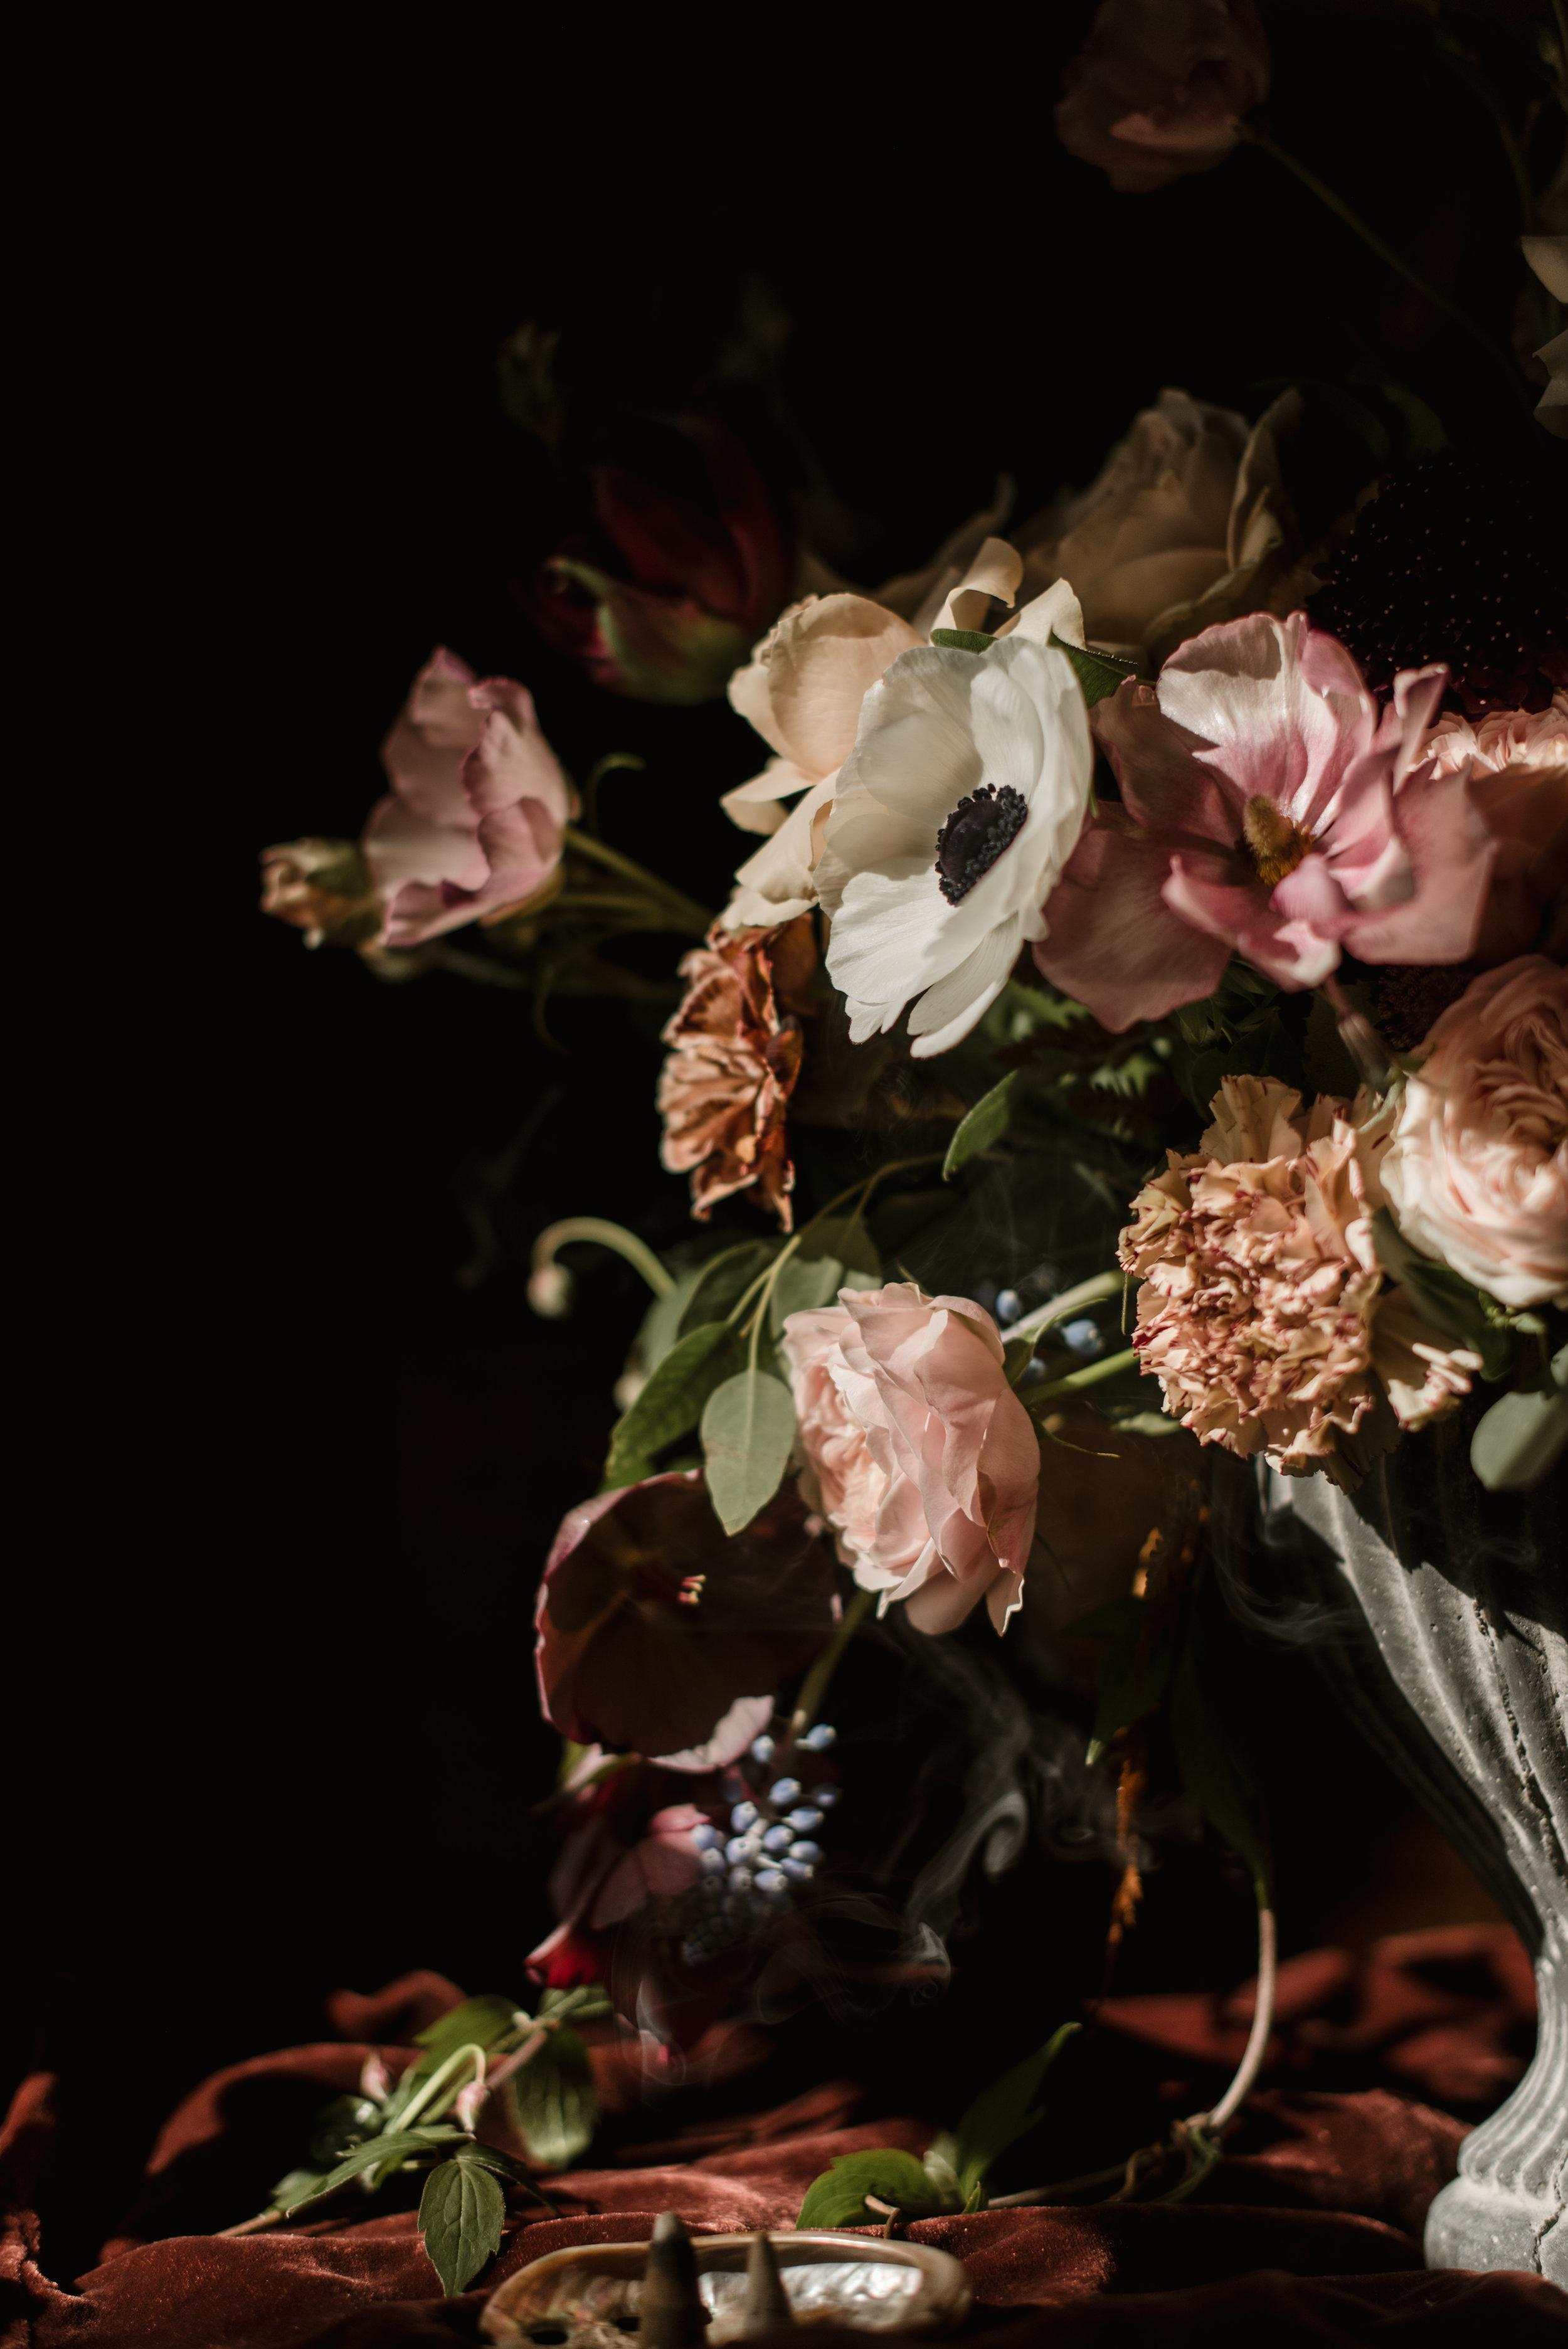 DarkRomance-GHphoto-56.jpg